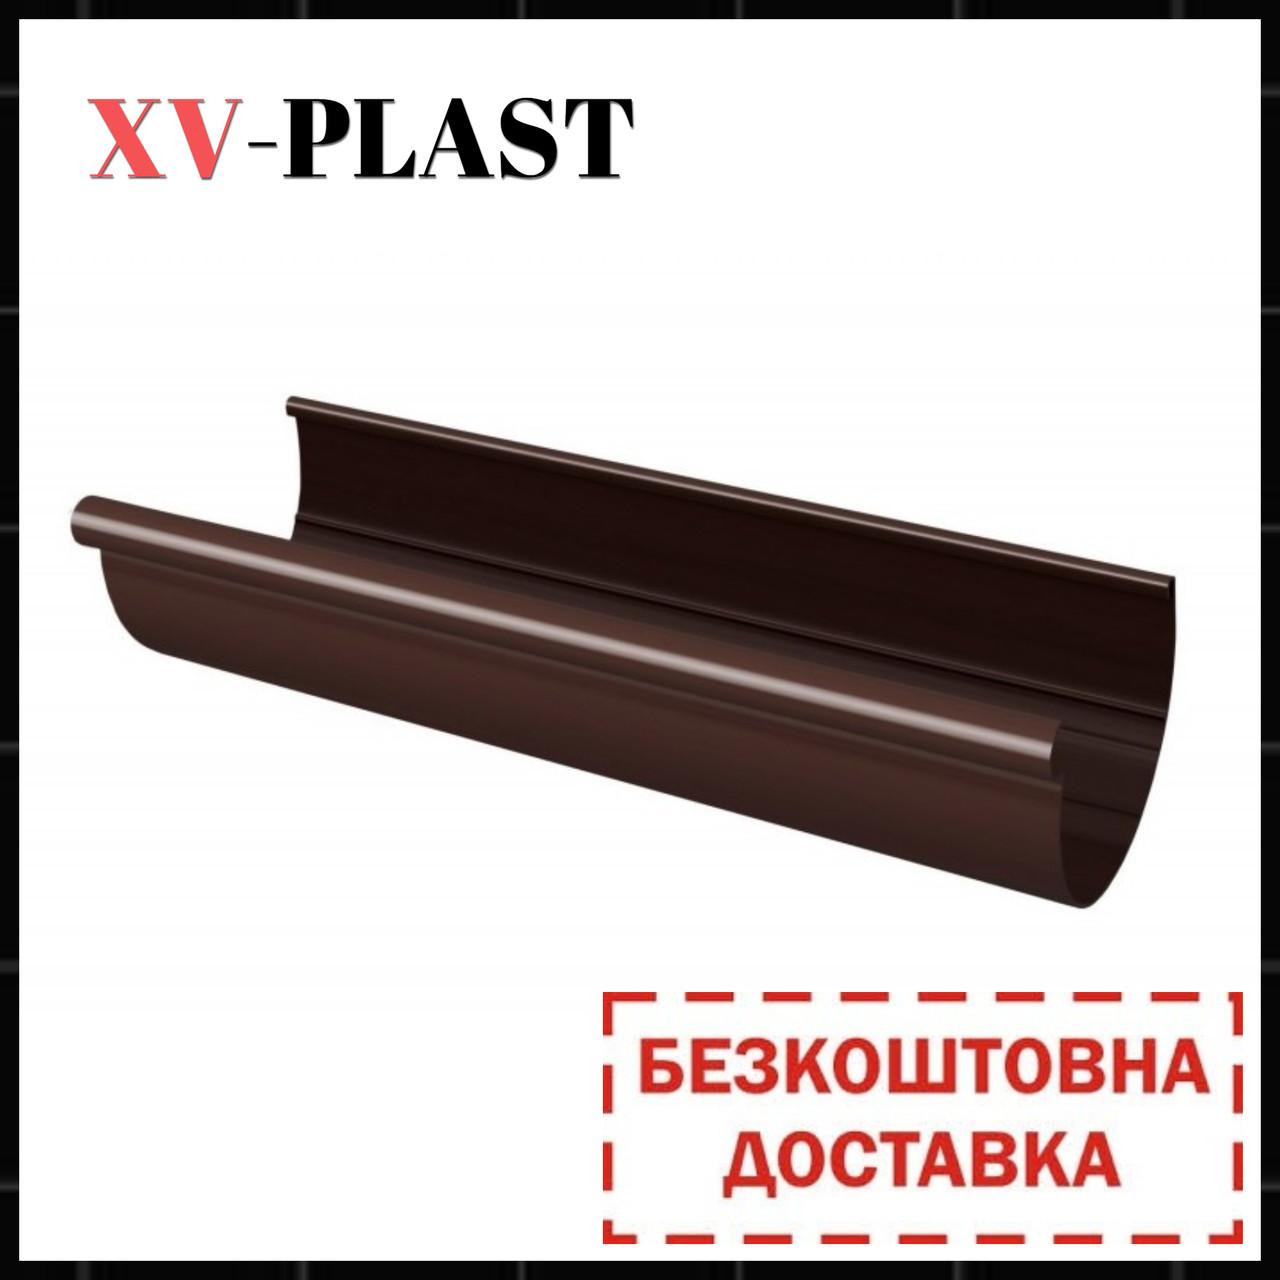 Ринва XV-PLAST 125 мм / 3 м.п.